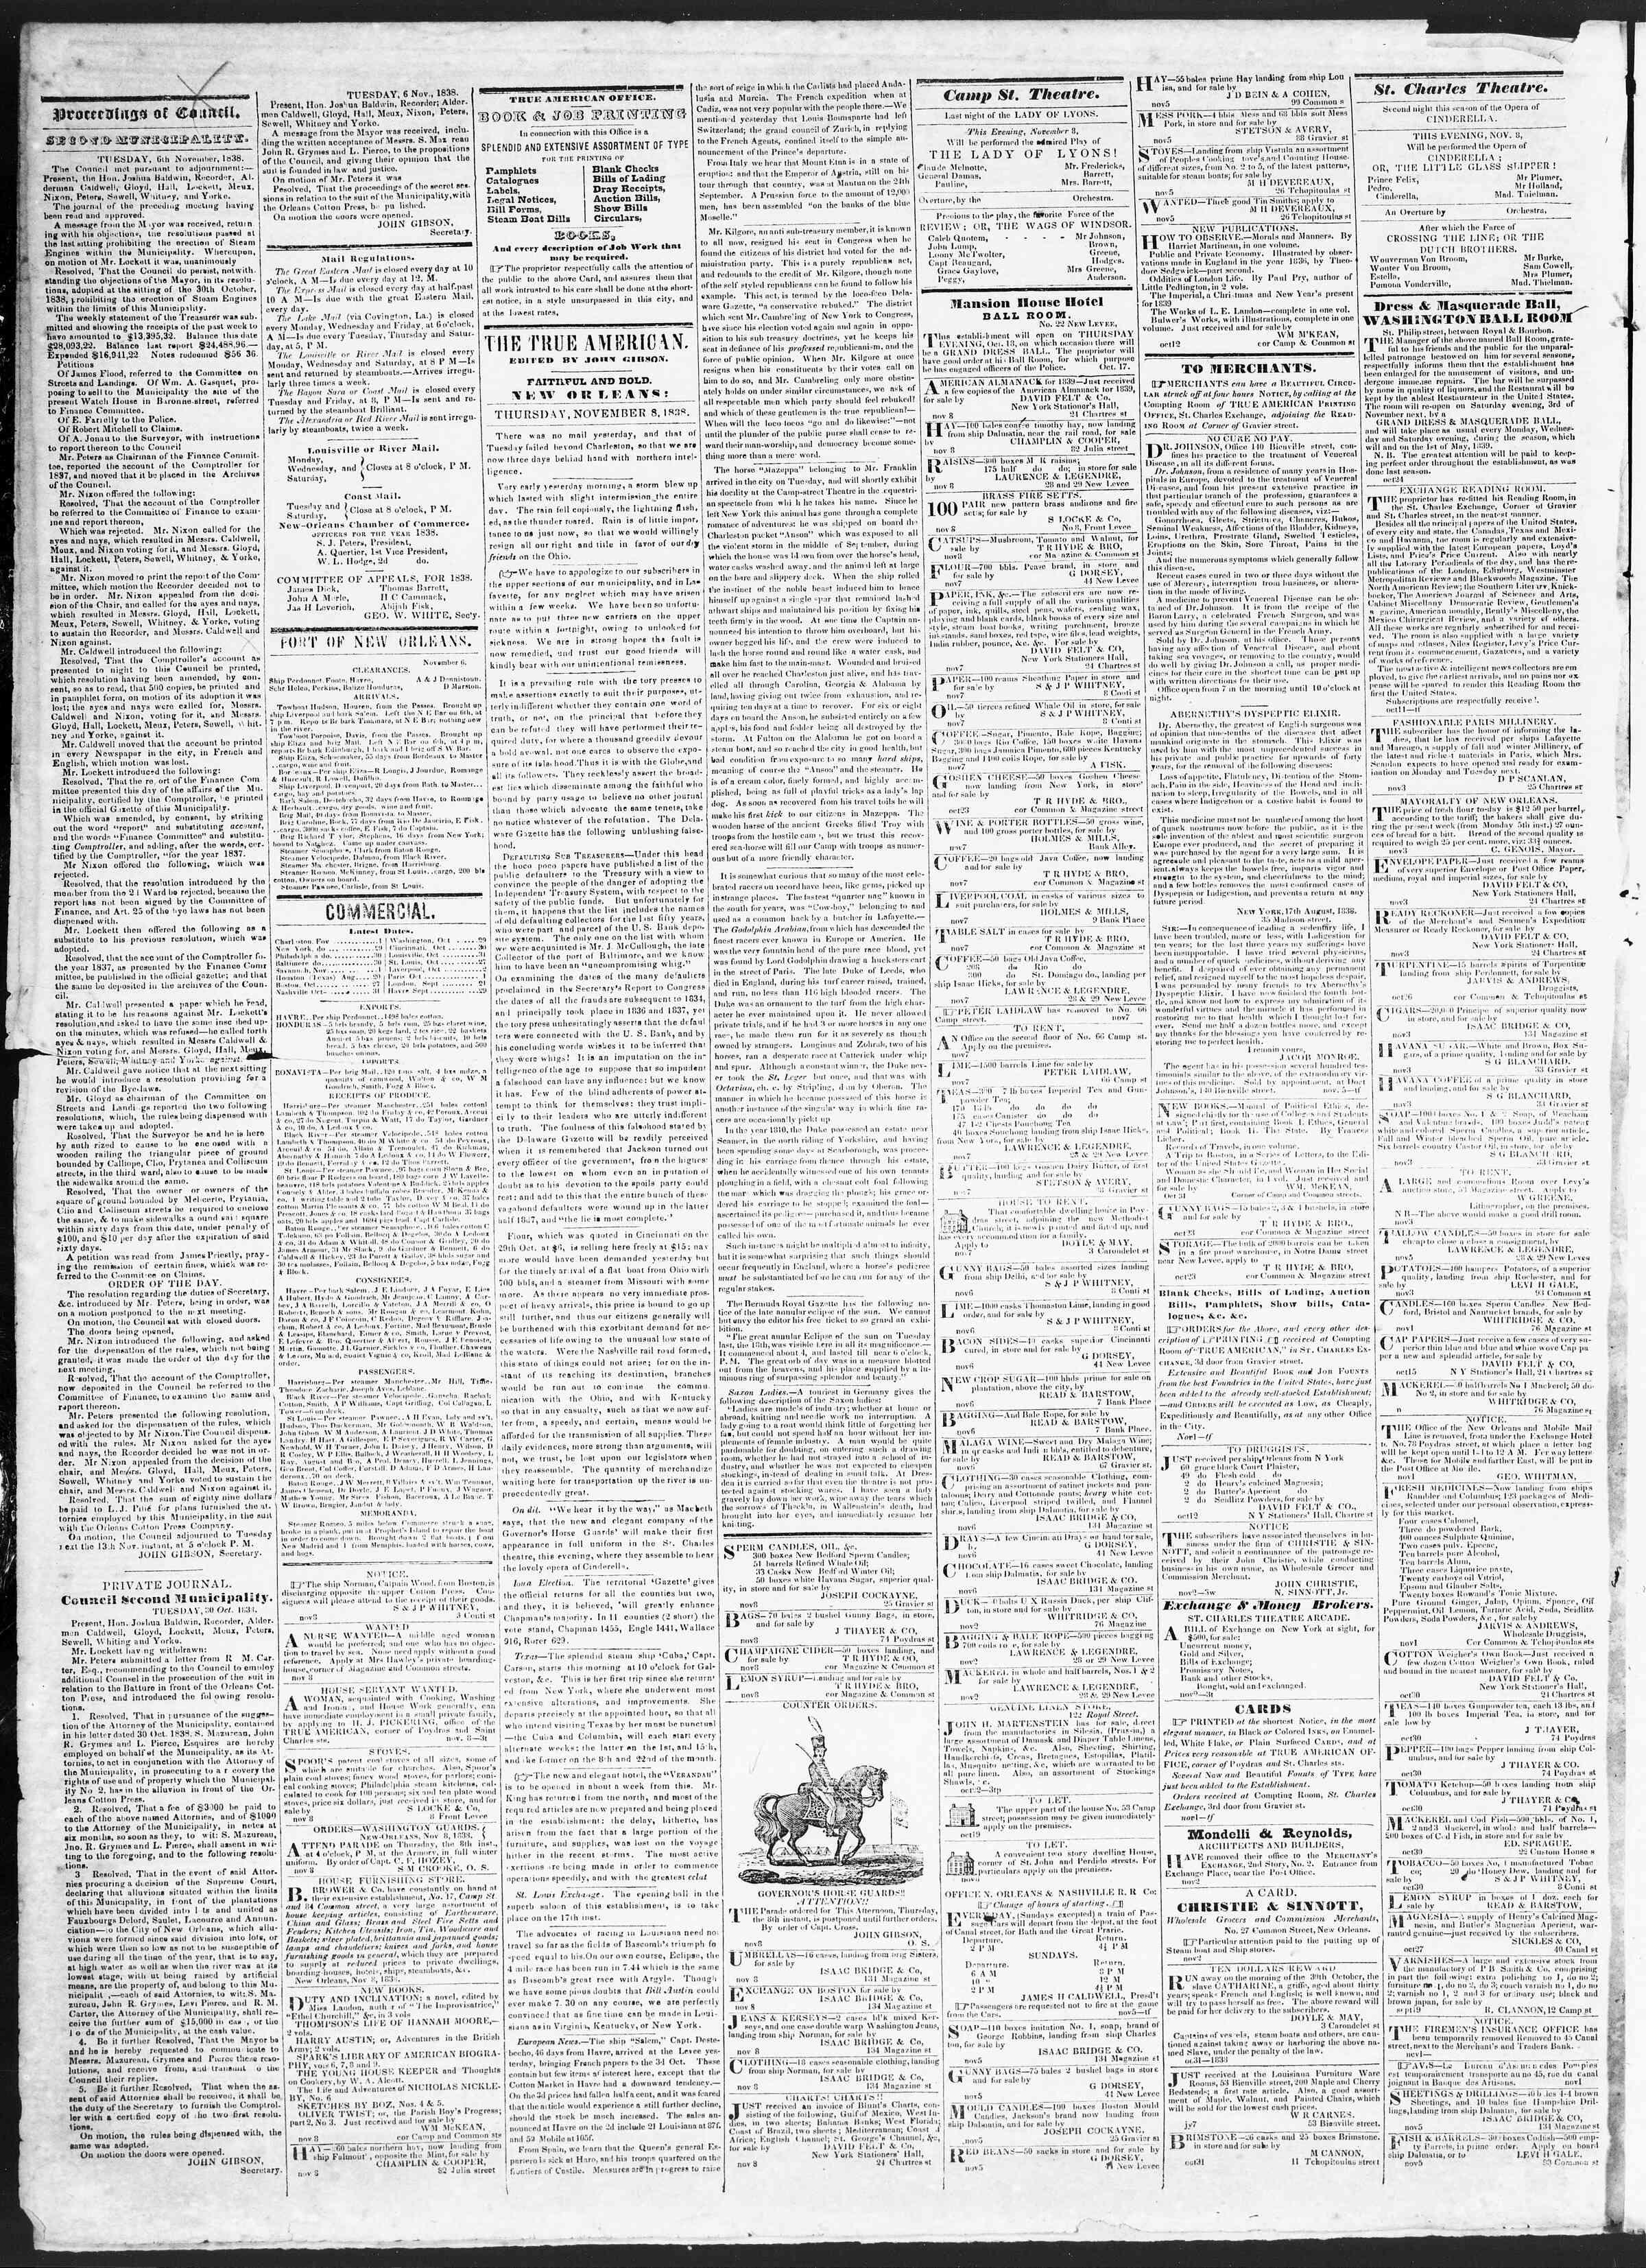 November 8, 1838 Tarihli True American Gazetesi Sayfa 2